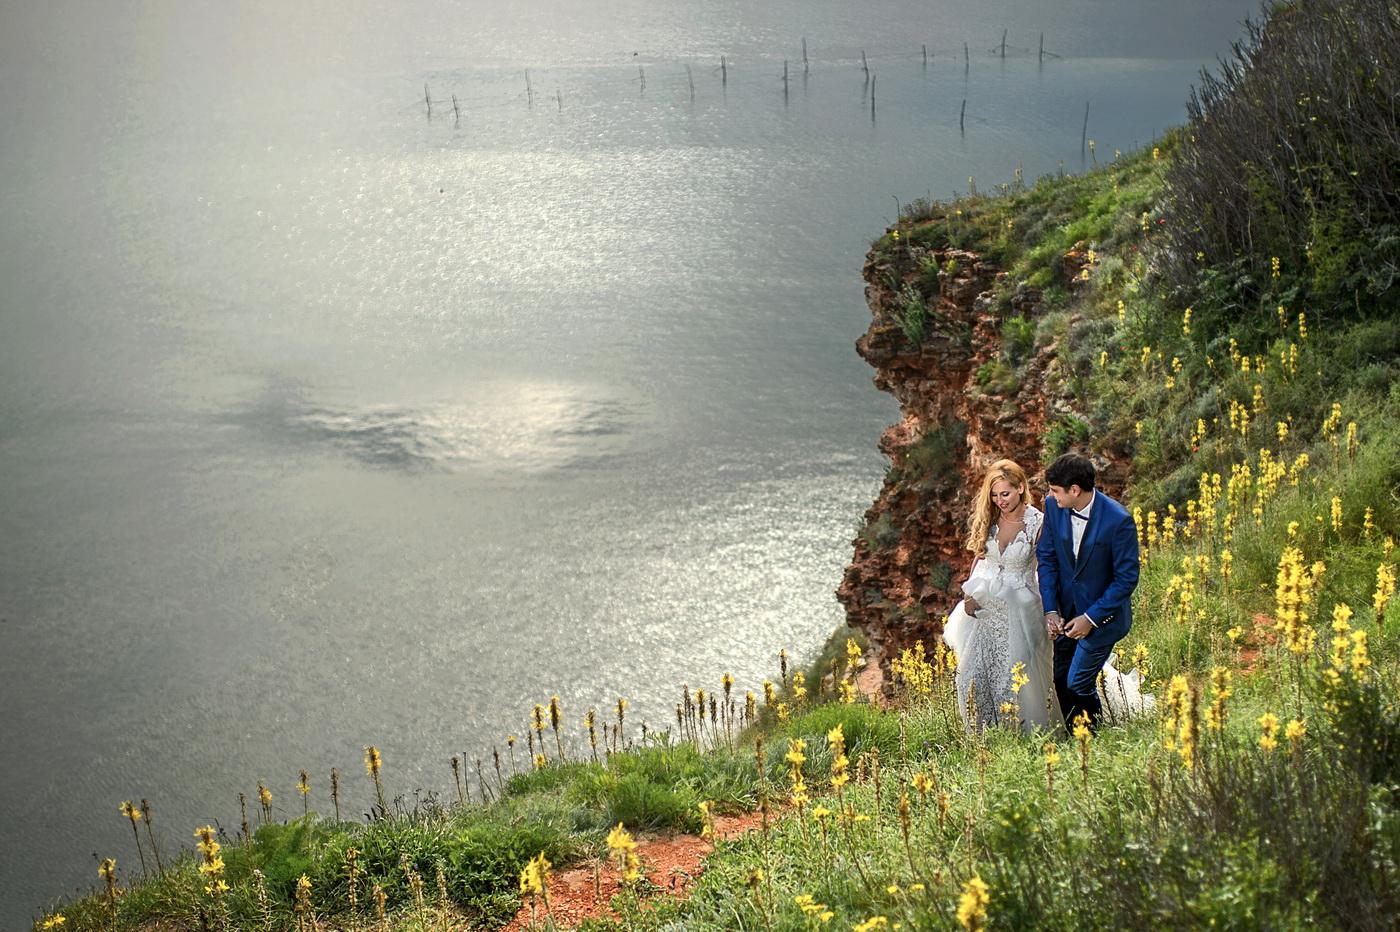 Destination Wedding Photographer_Marian Sterea_089.jpg